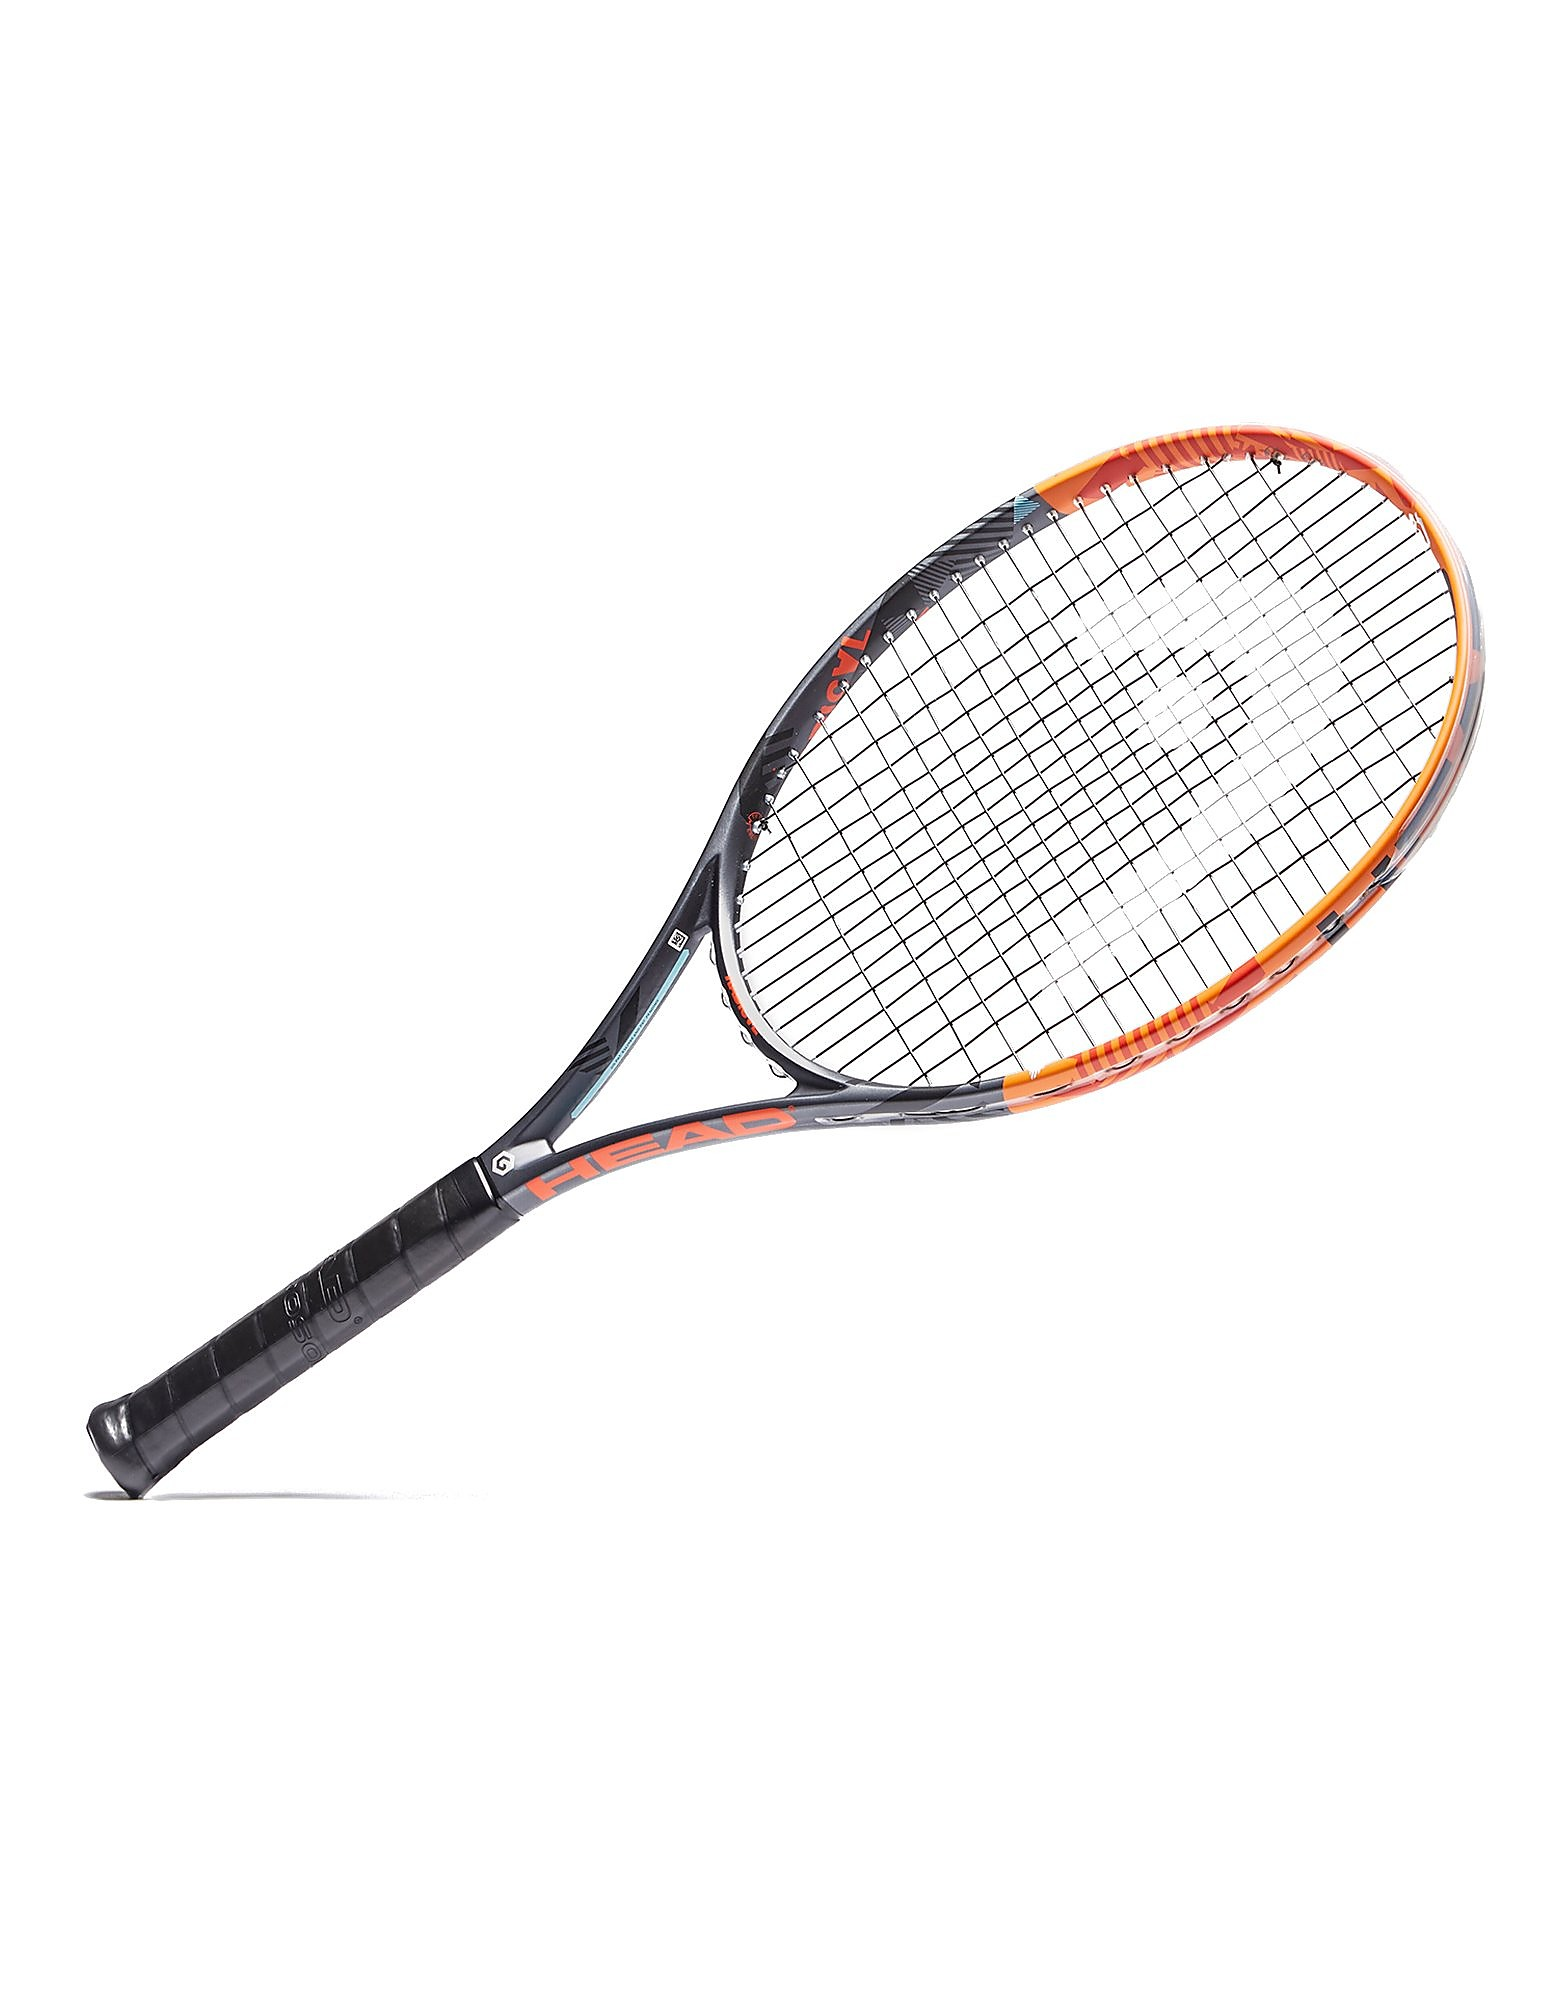 Head Graphene XT Radical Lite Tennis Racket